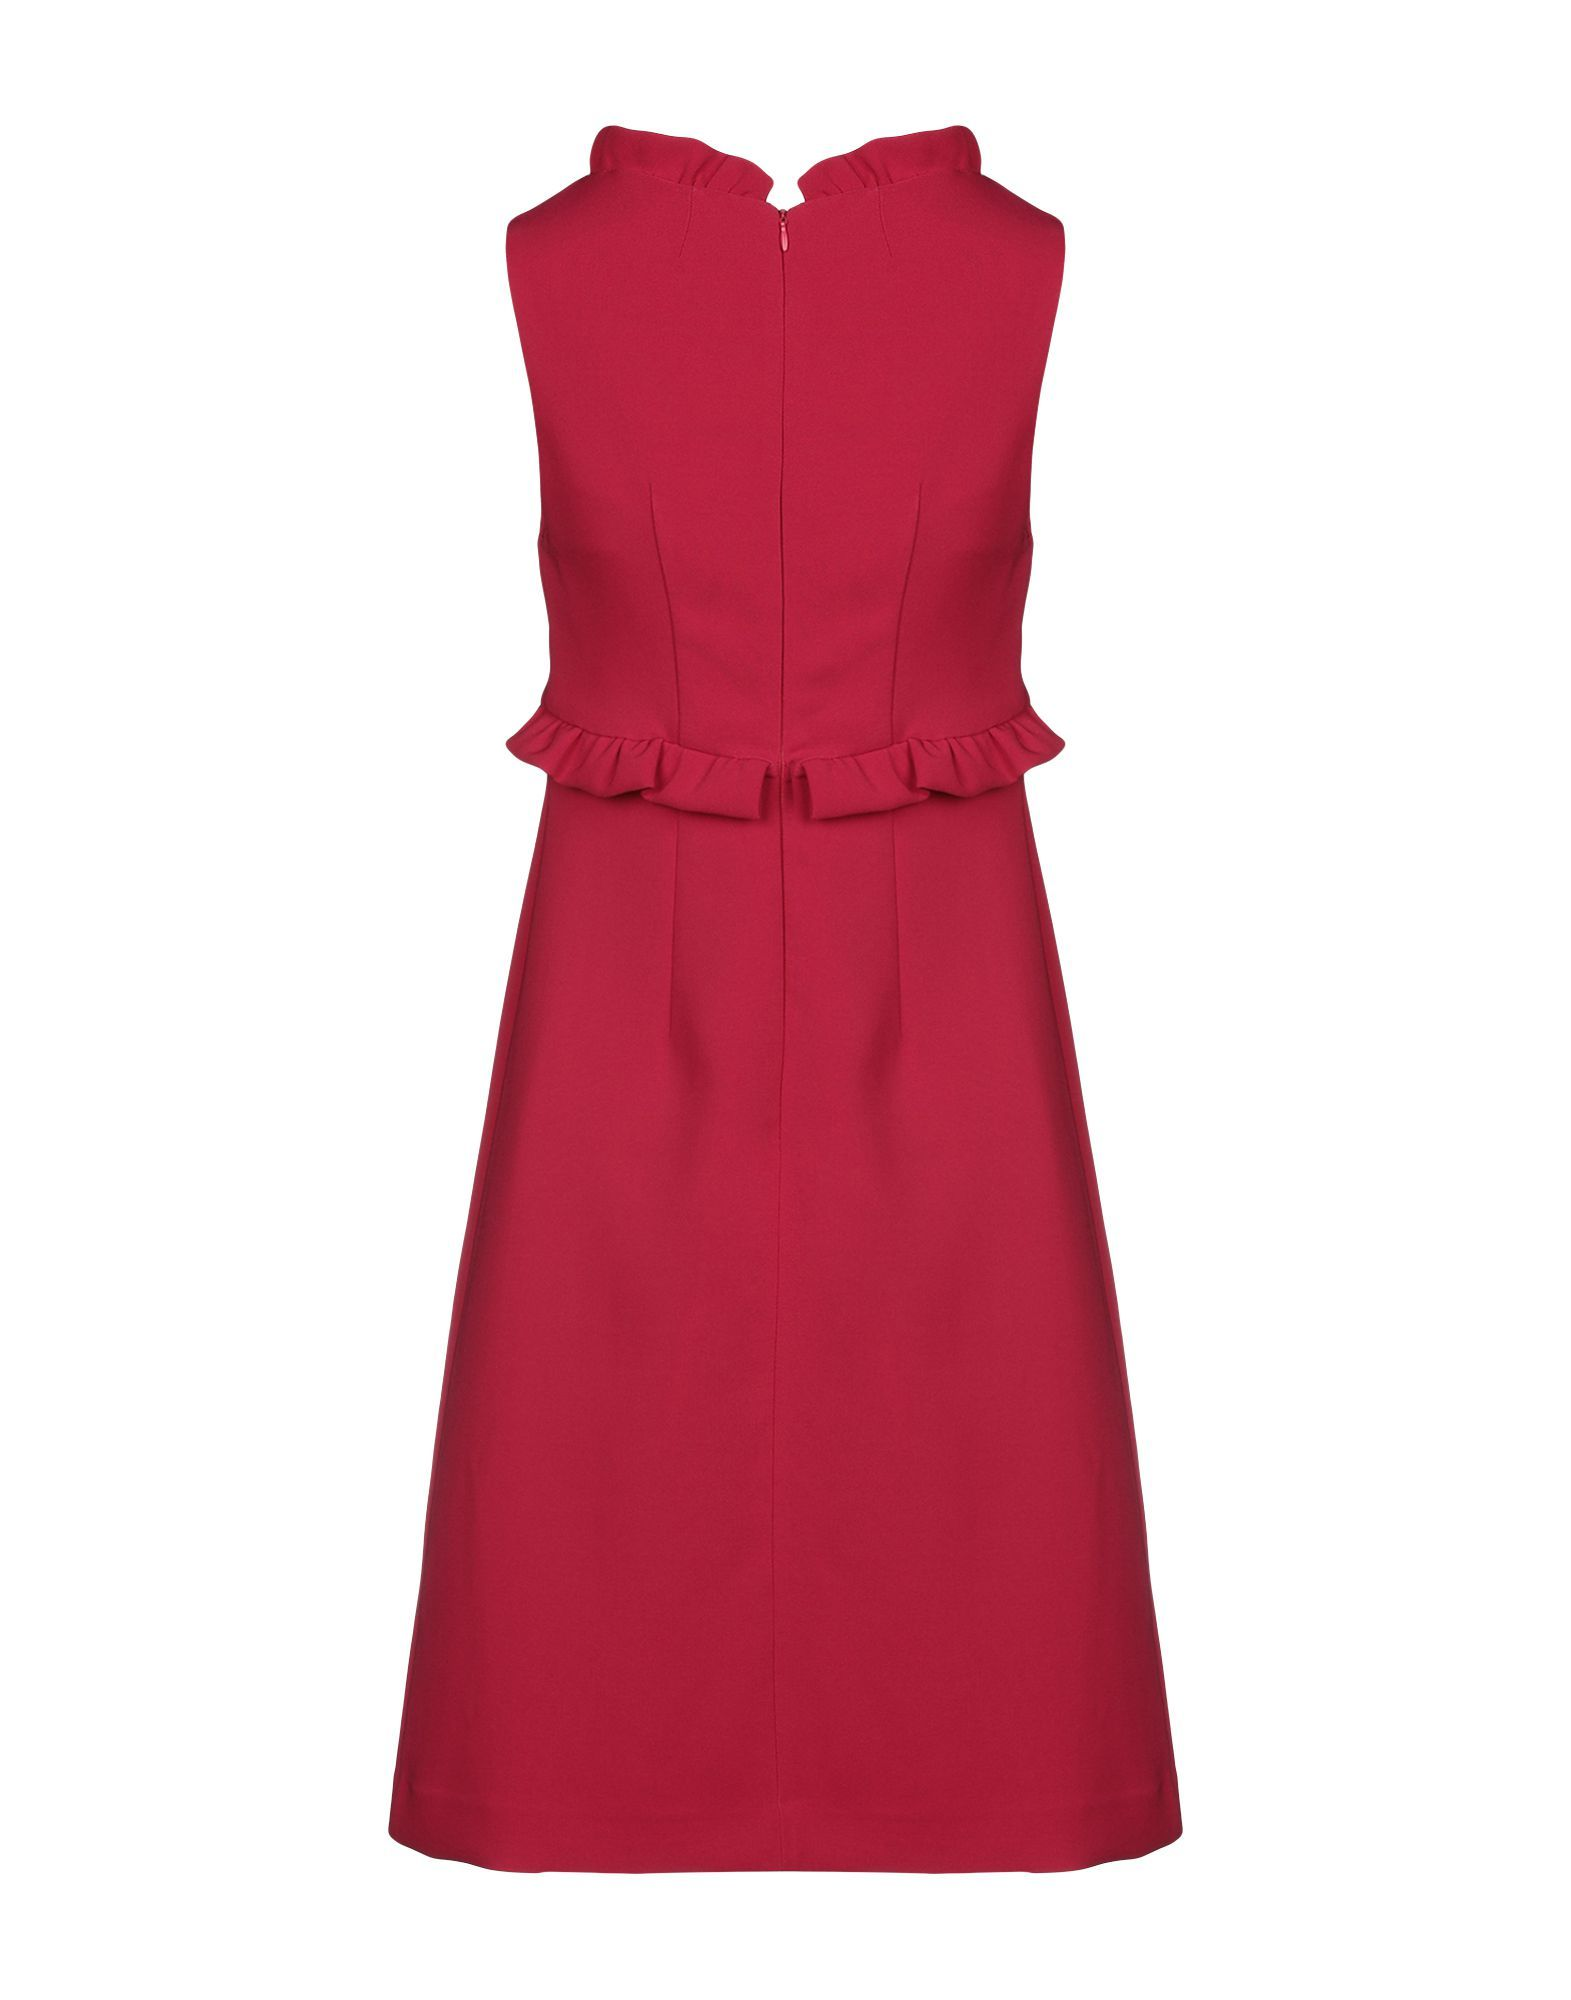 P.A.R.O.S.H. Garnet Crepe Ruffled Dress